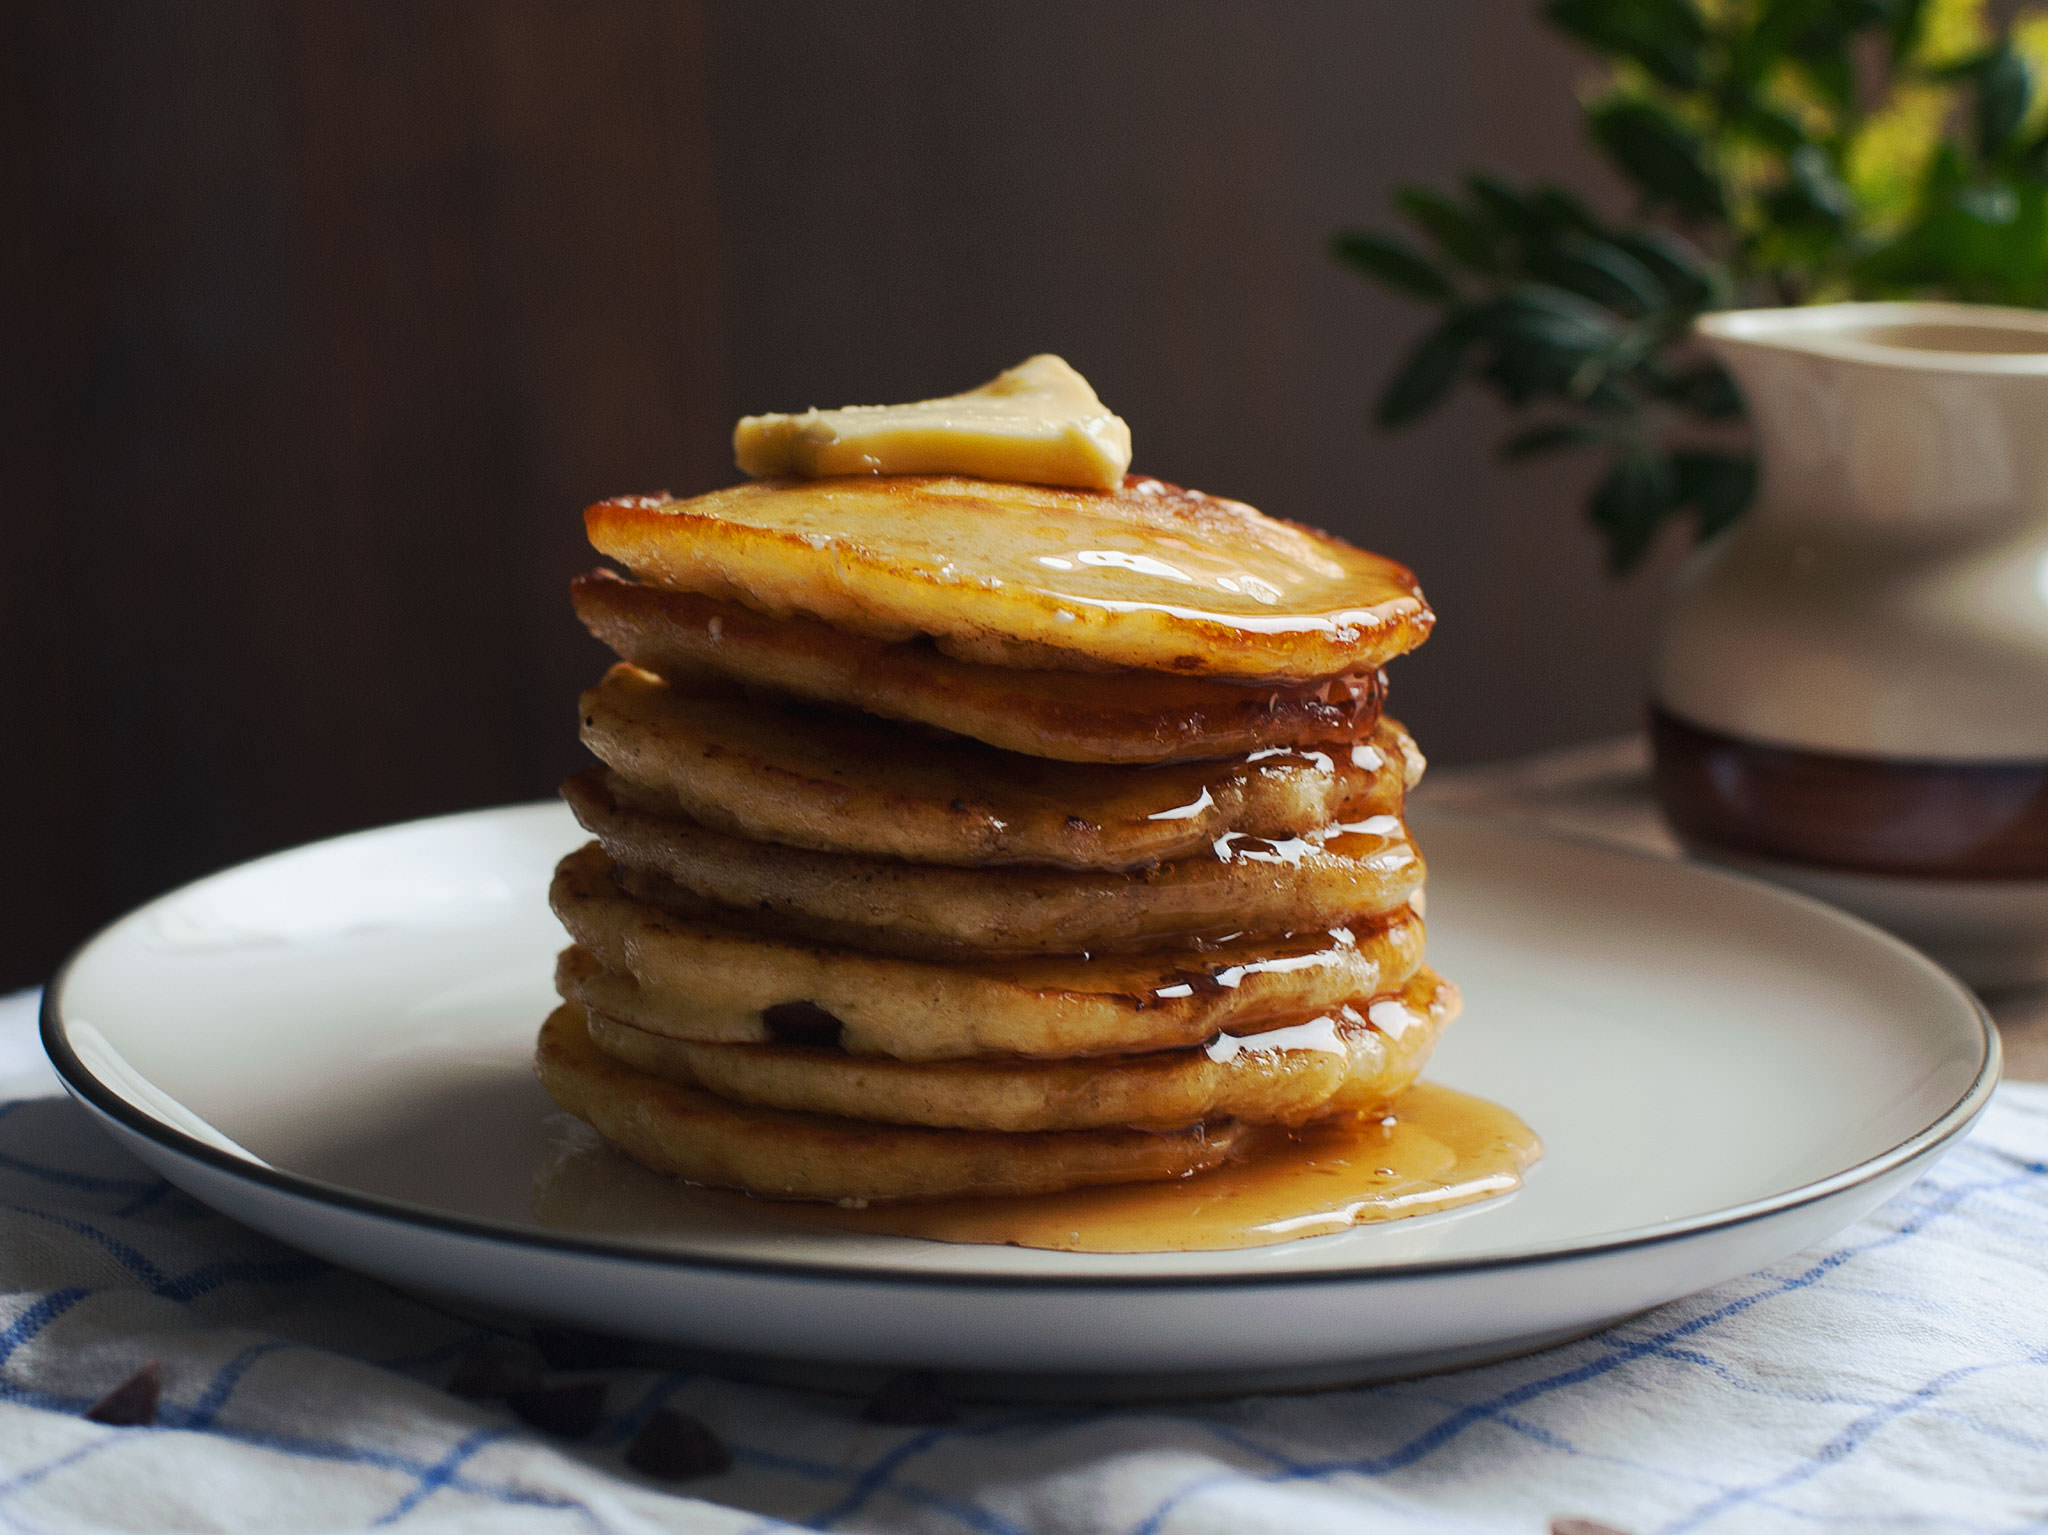 All American Pancakes Recipes Kitchen Stories Watermelon Wallpaper Rainbow Find Free HD for Desktop [freshlhys.tk]